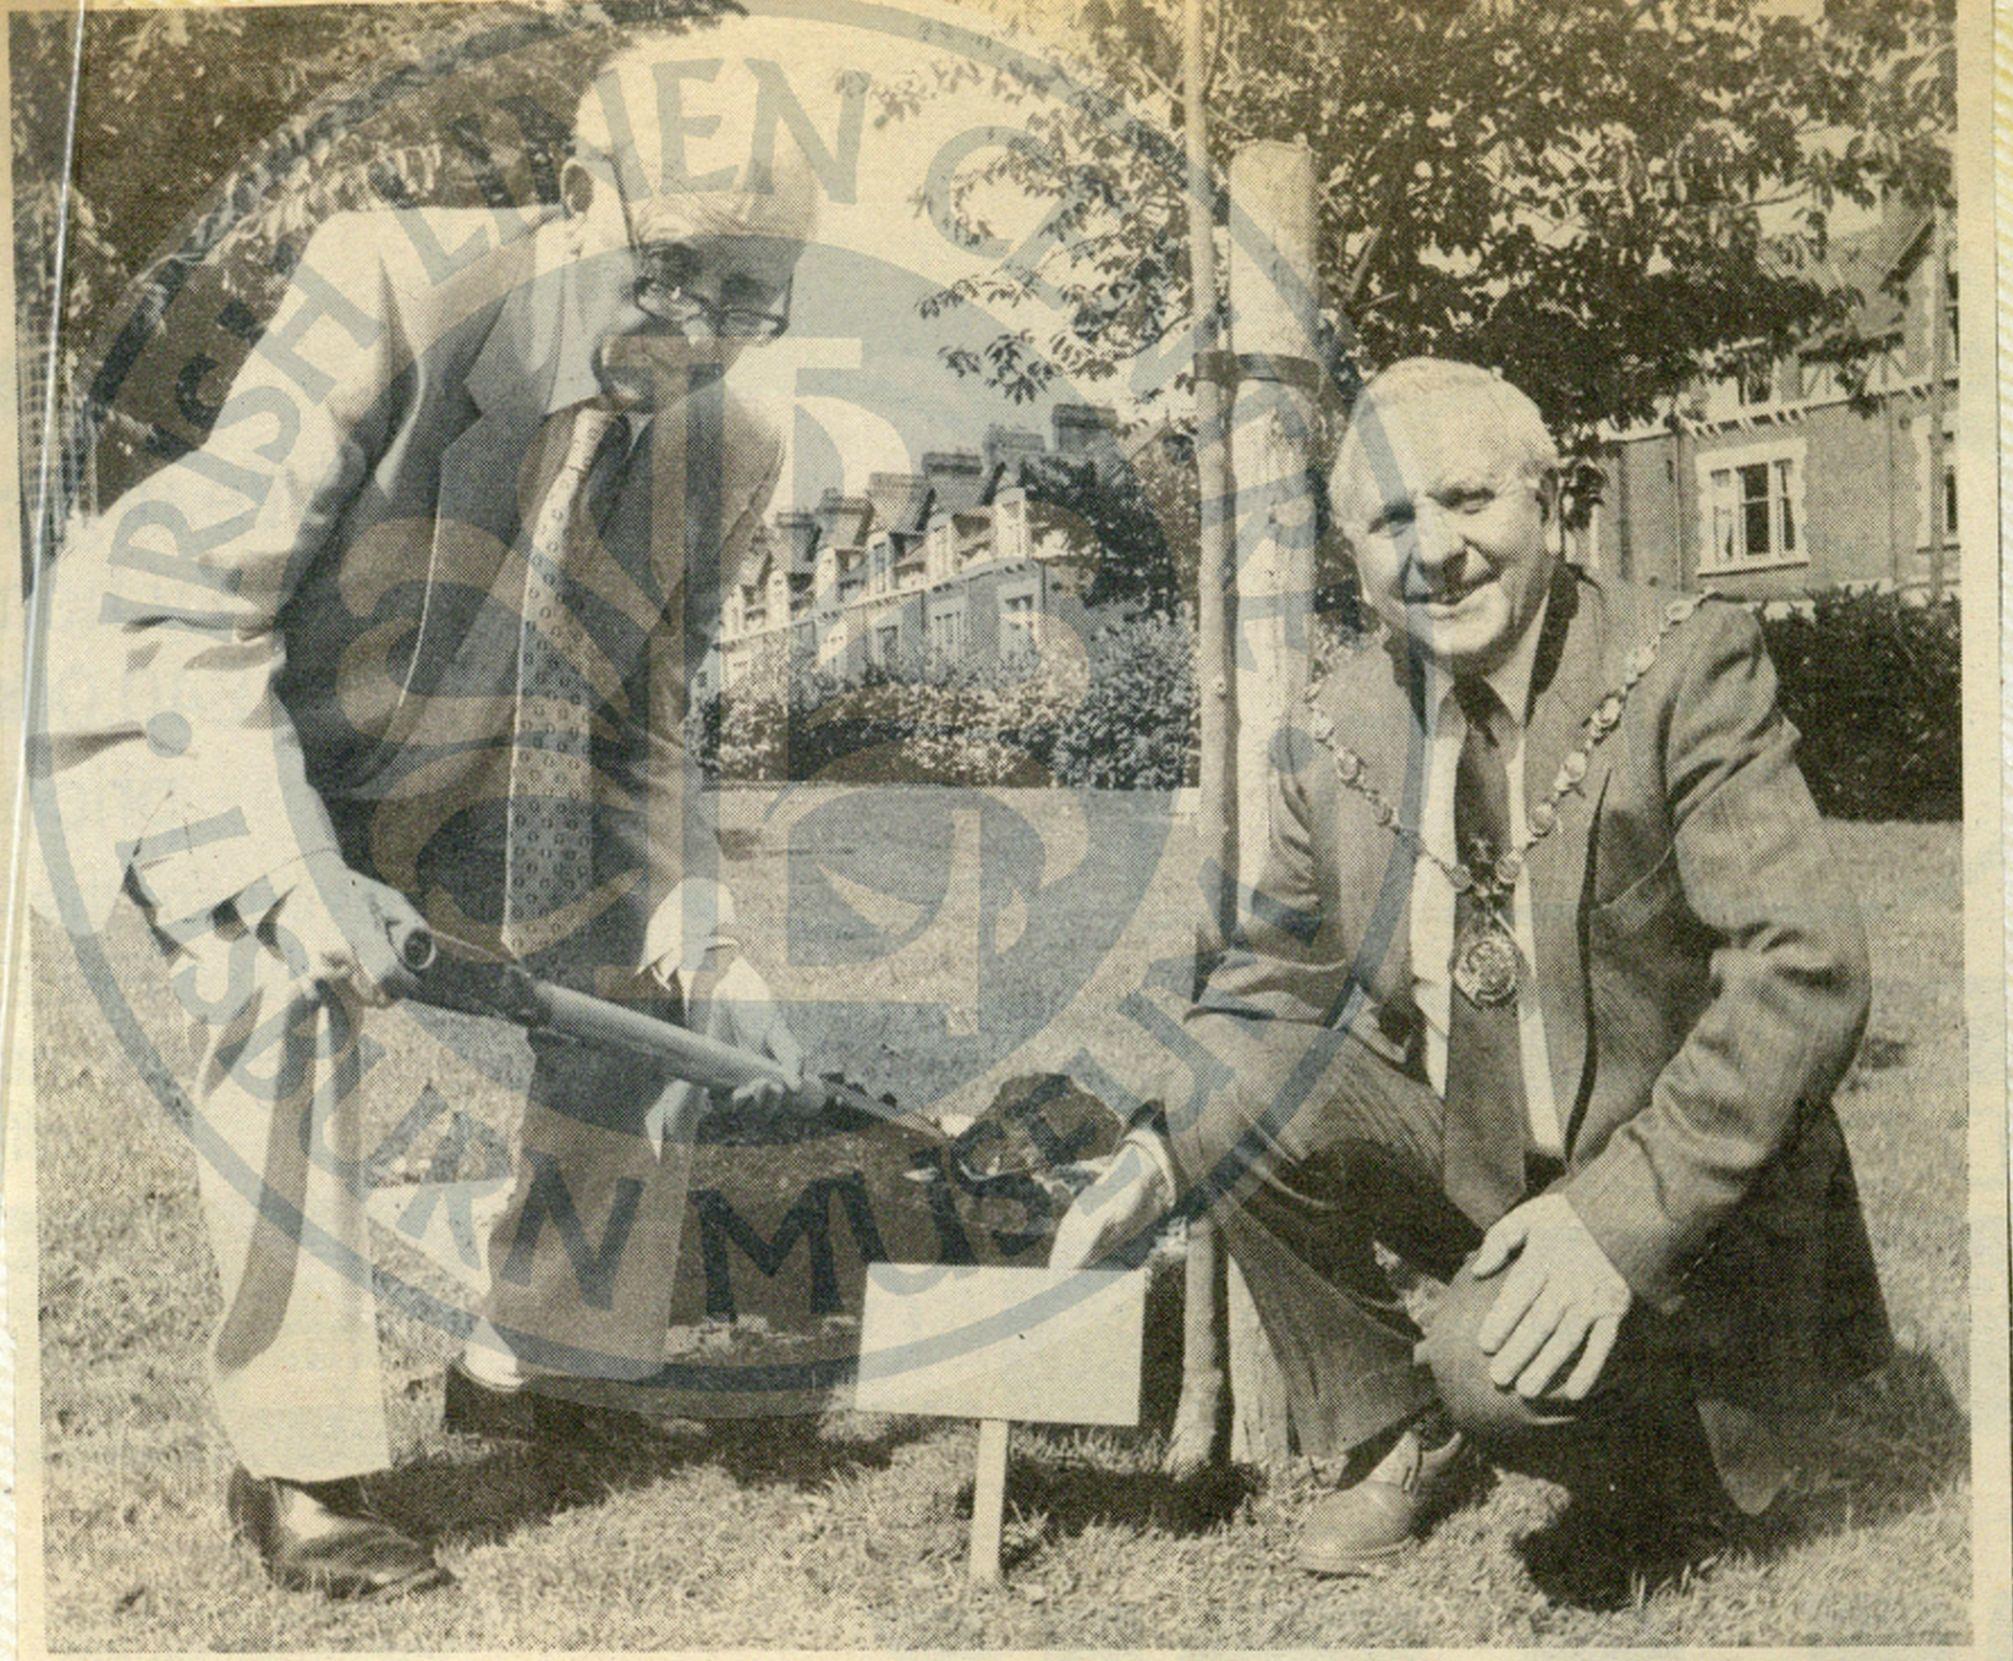 Professor Pantridge with Mayor McAllister, Wallace Park, 1991